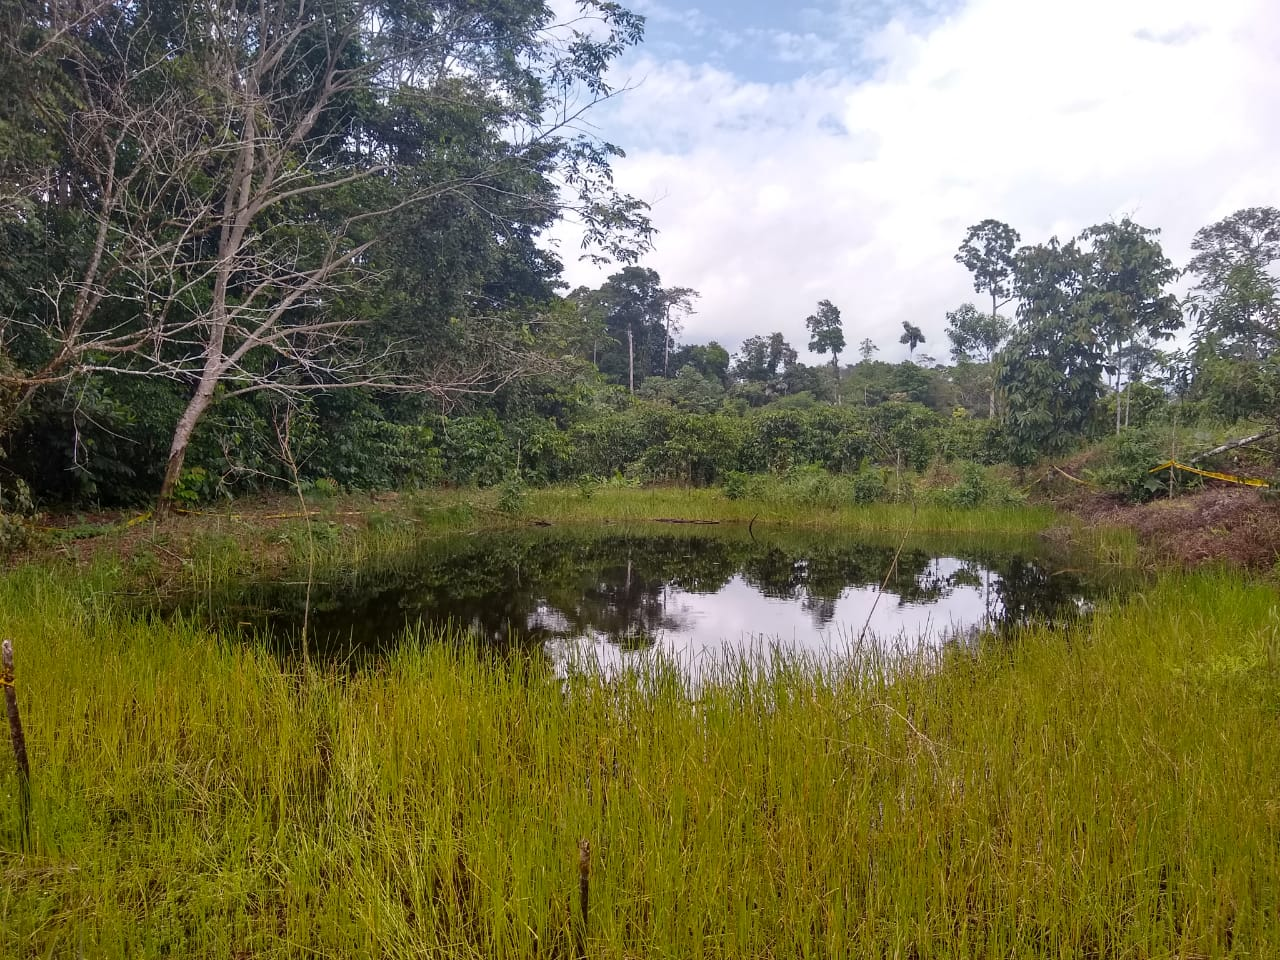 Pasivo Ambiental en Chanangué